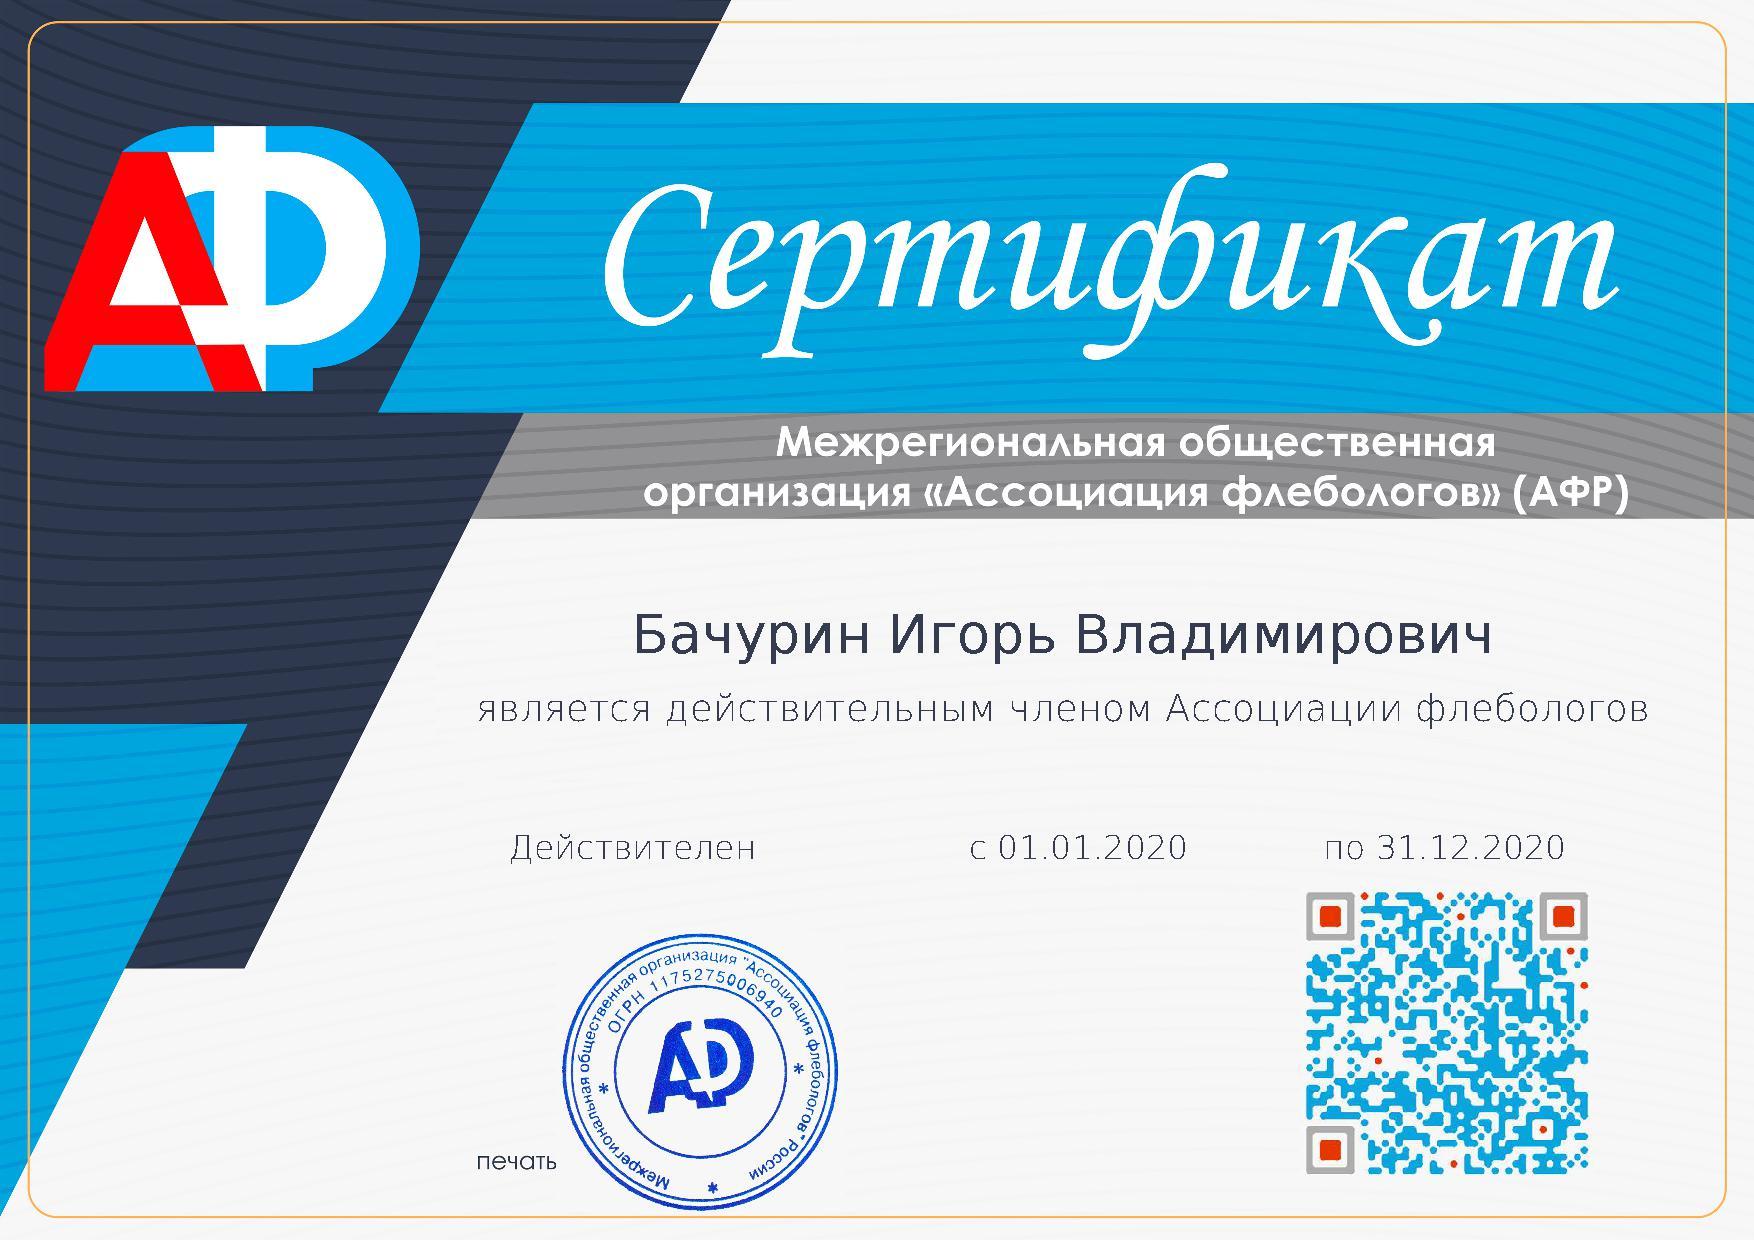 Сертификат АФР